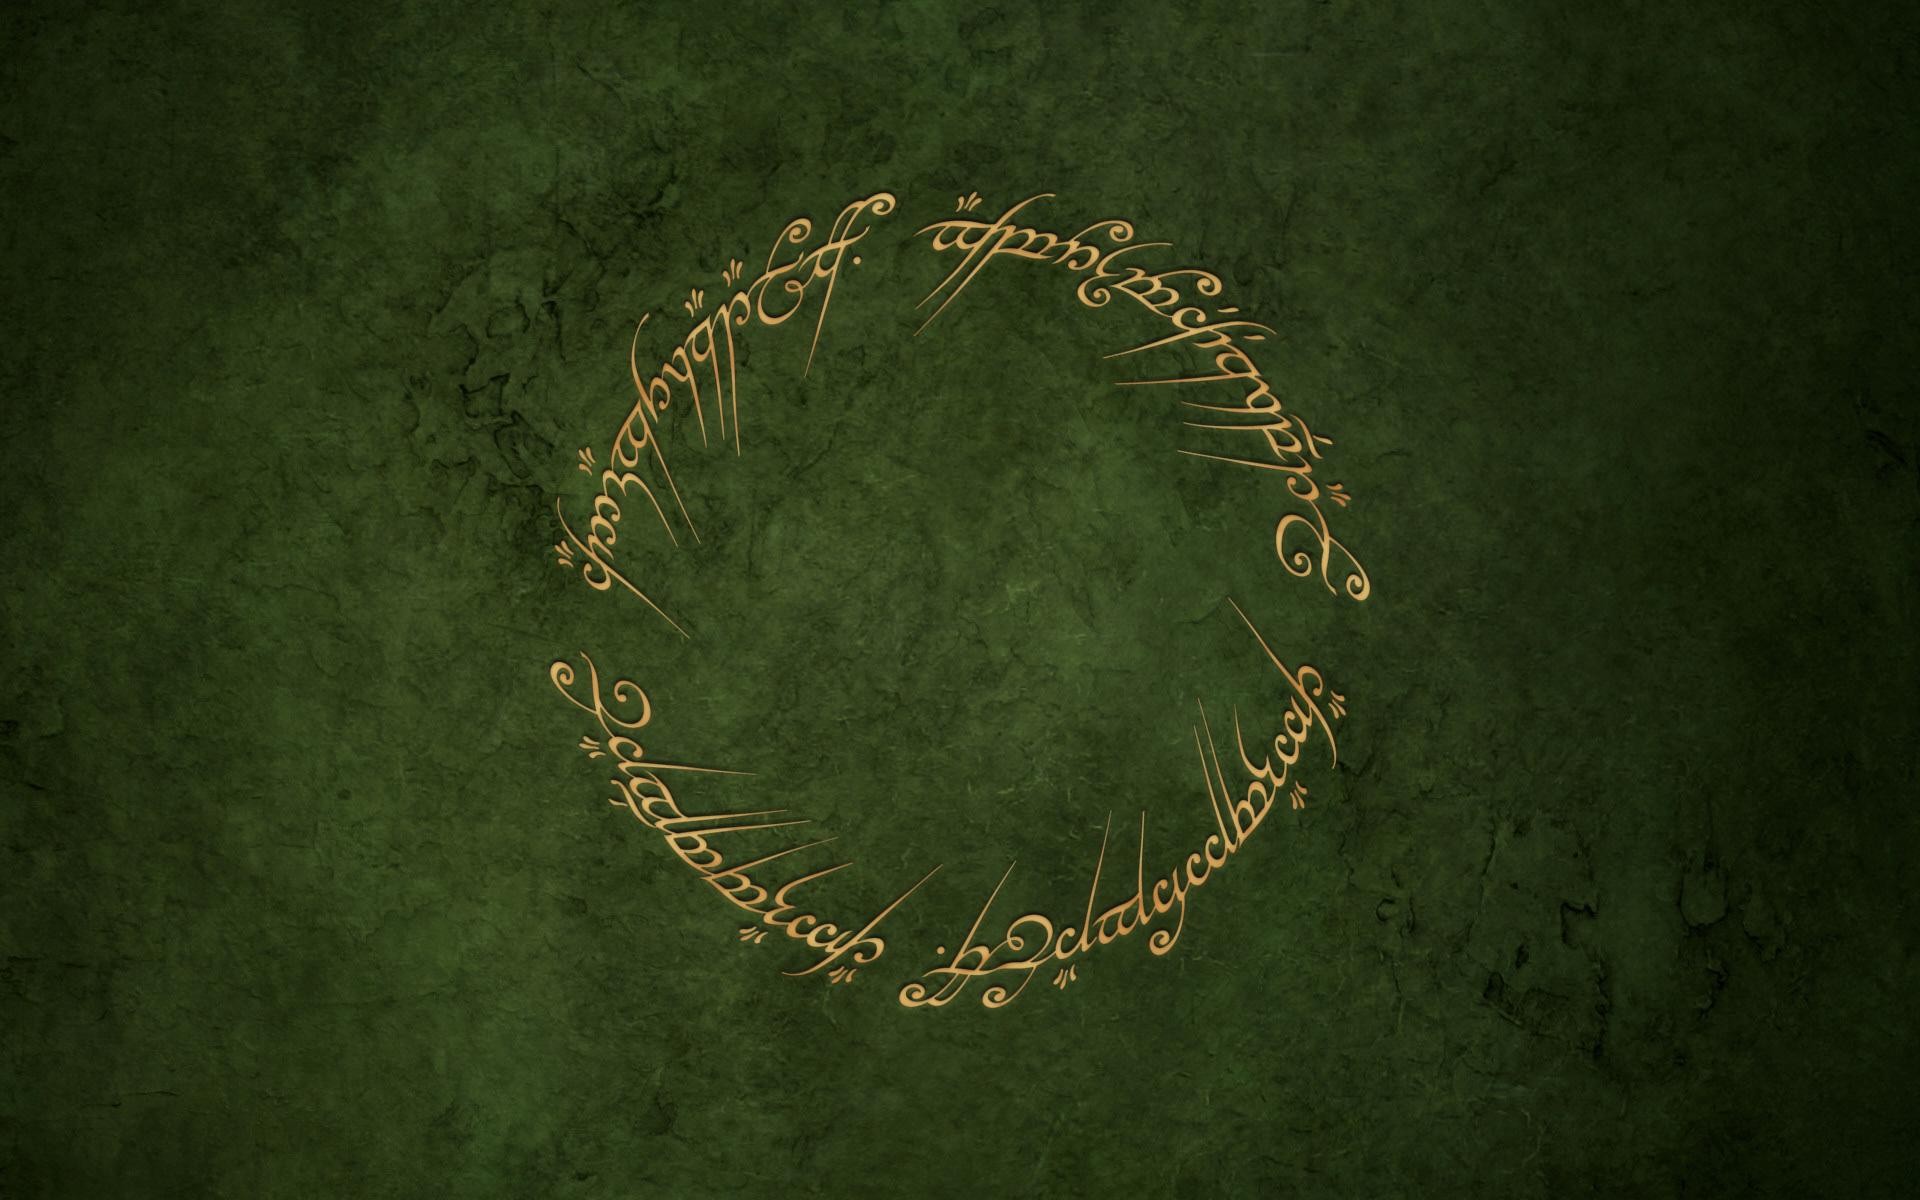 rings wallpaper 845243 lord of the rings wallpaper hd 845281 1920x1200